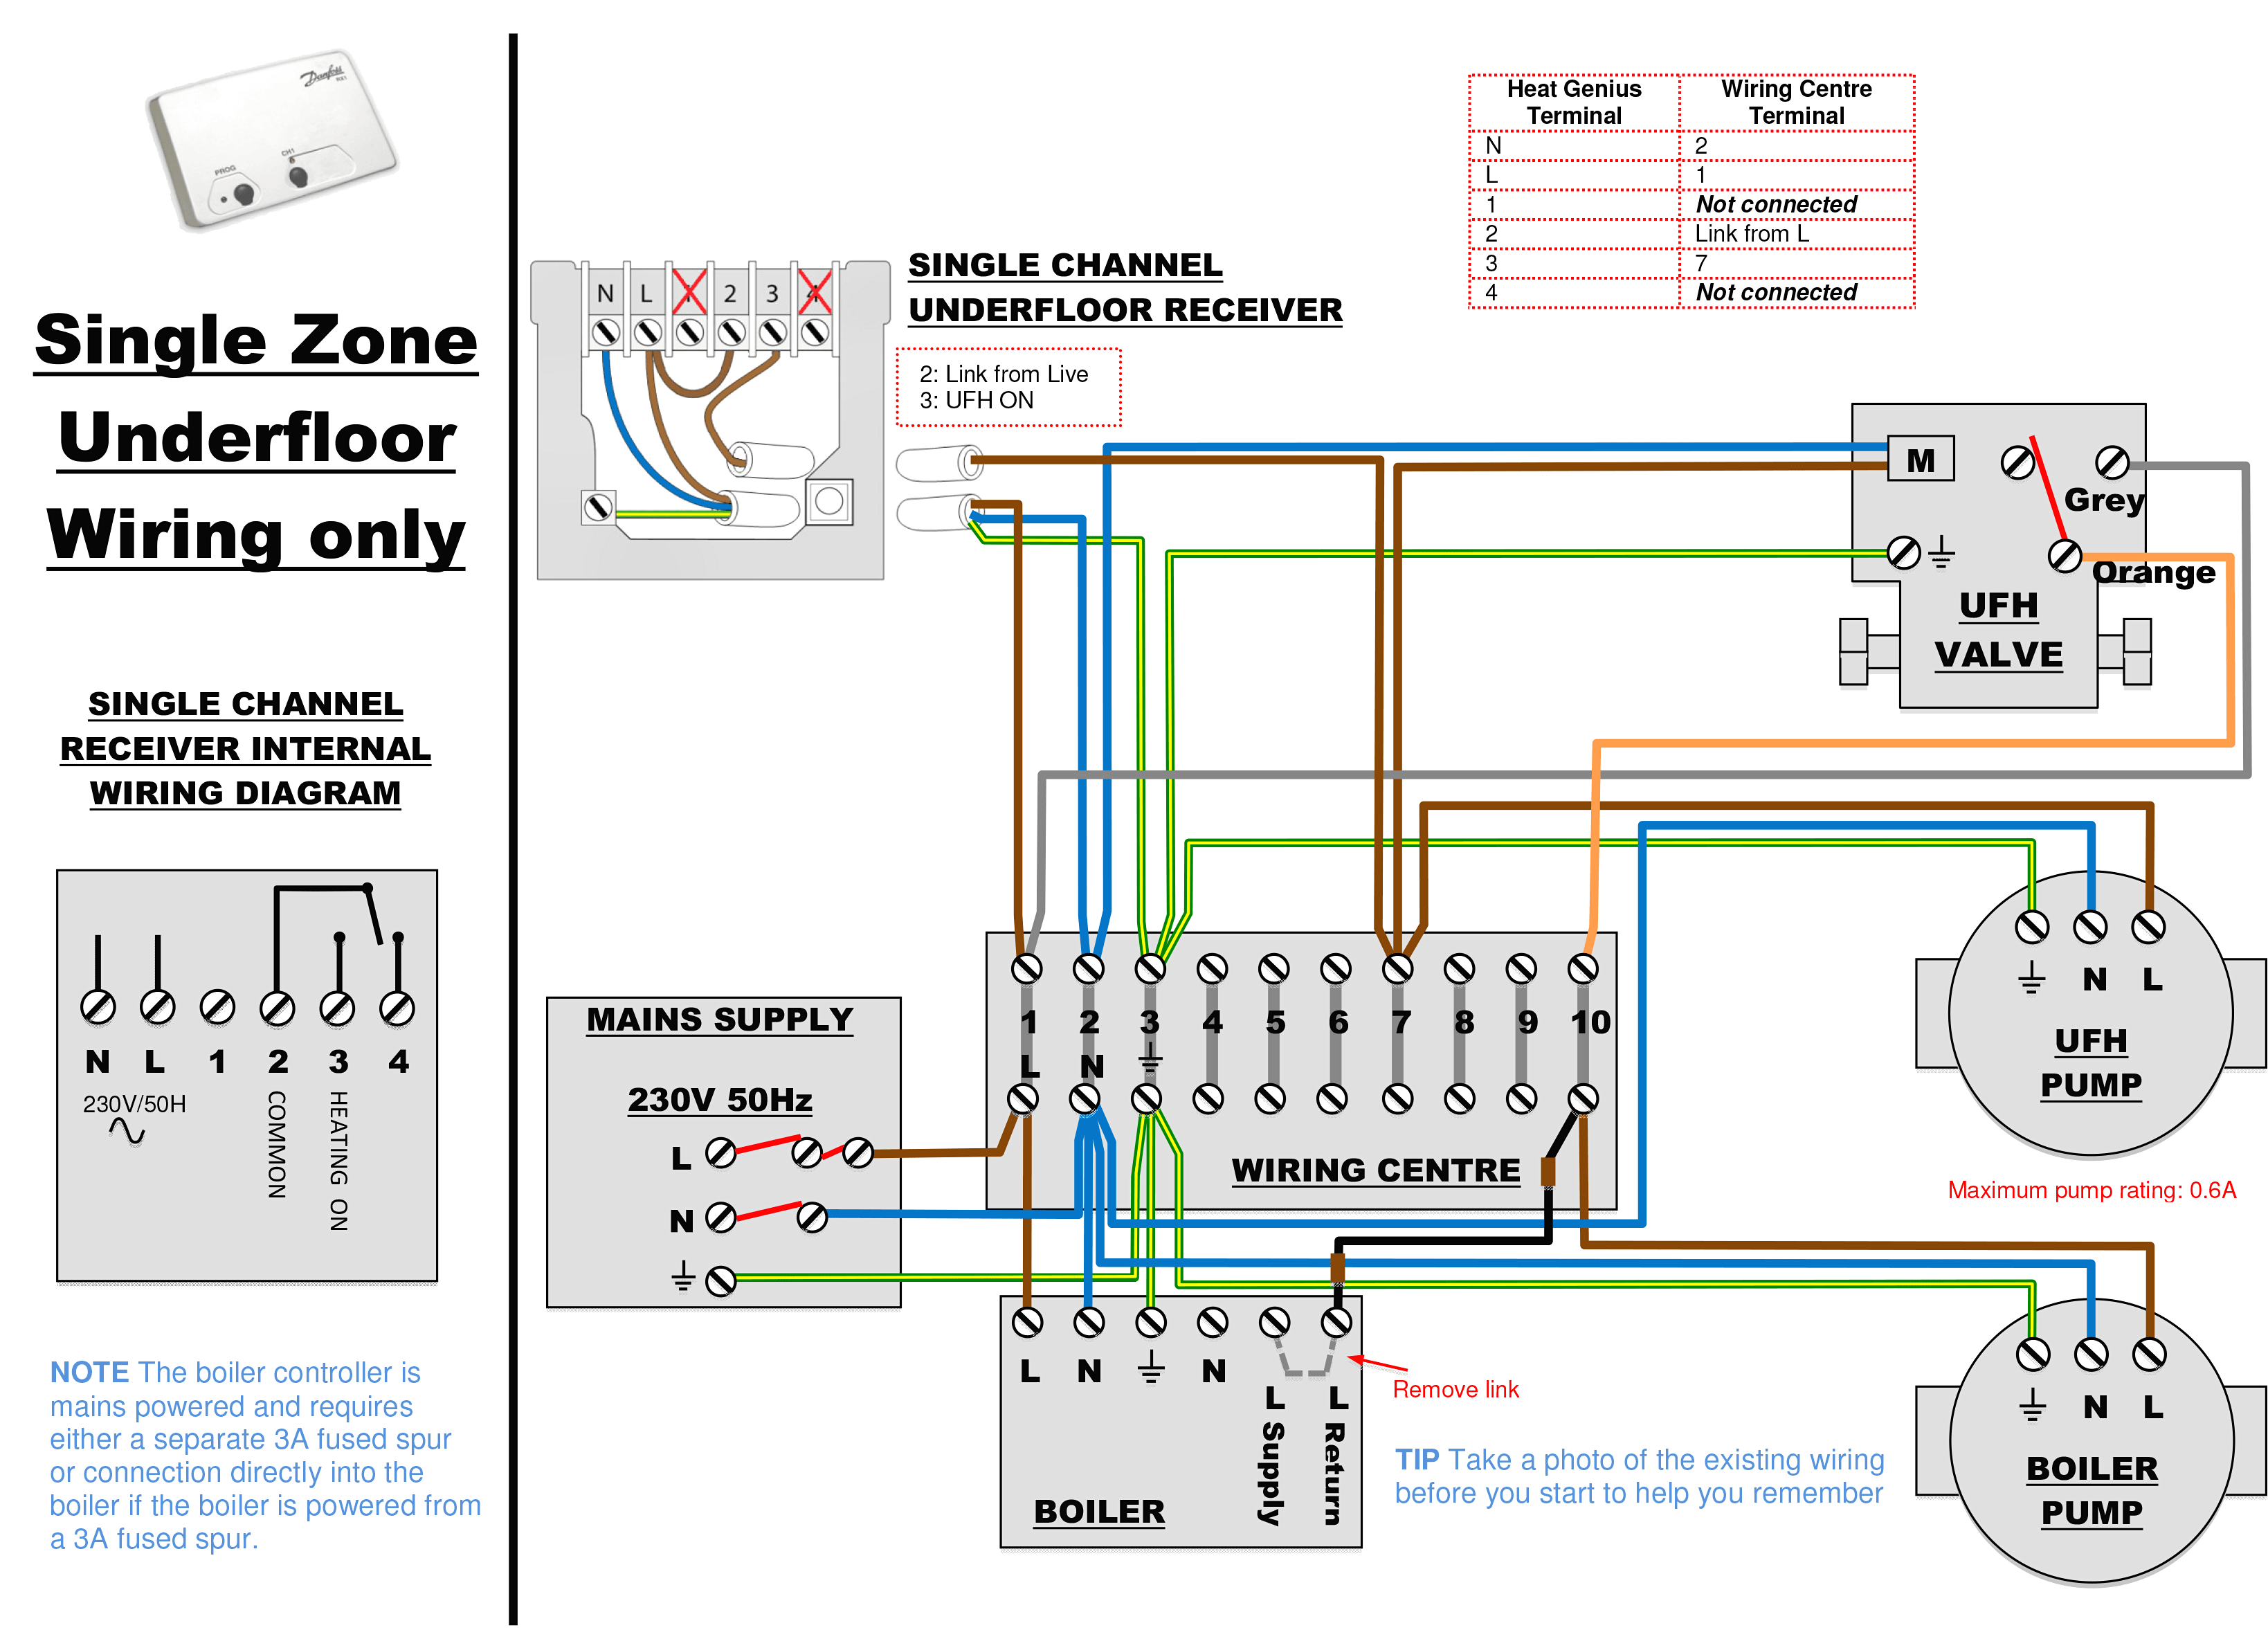 unique drayton 22mm mid position valve wiring diagram diagram diagramsample diagramtemplate wiringdiagram [ 3277 x 2355 Pixel ]